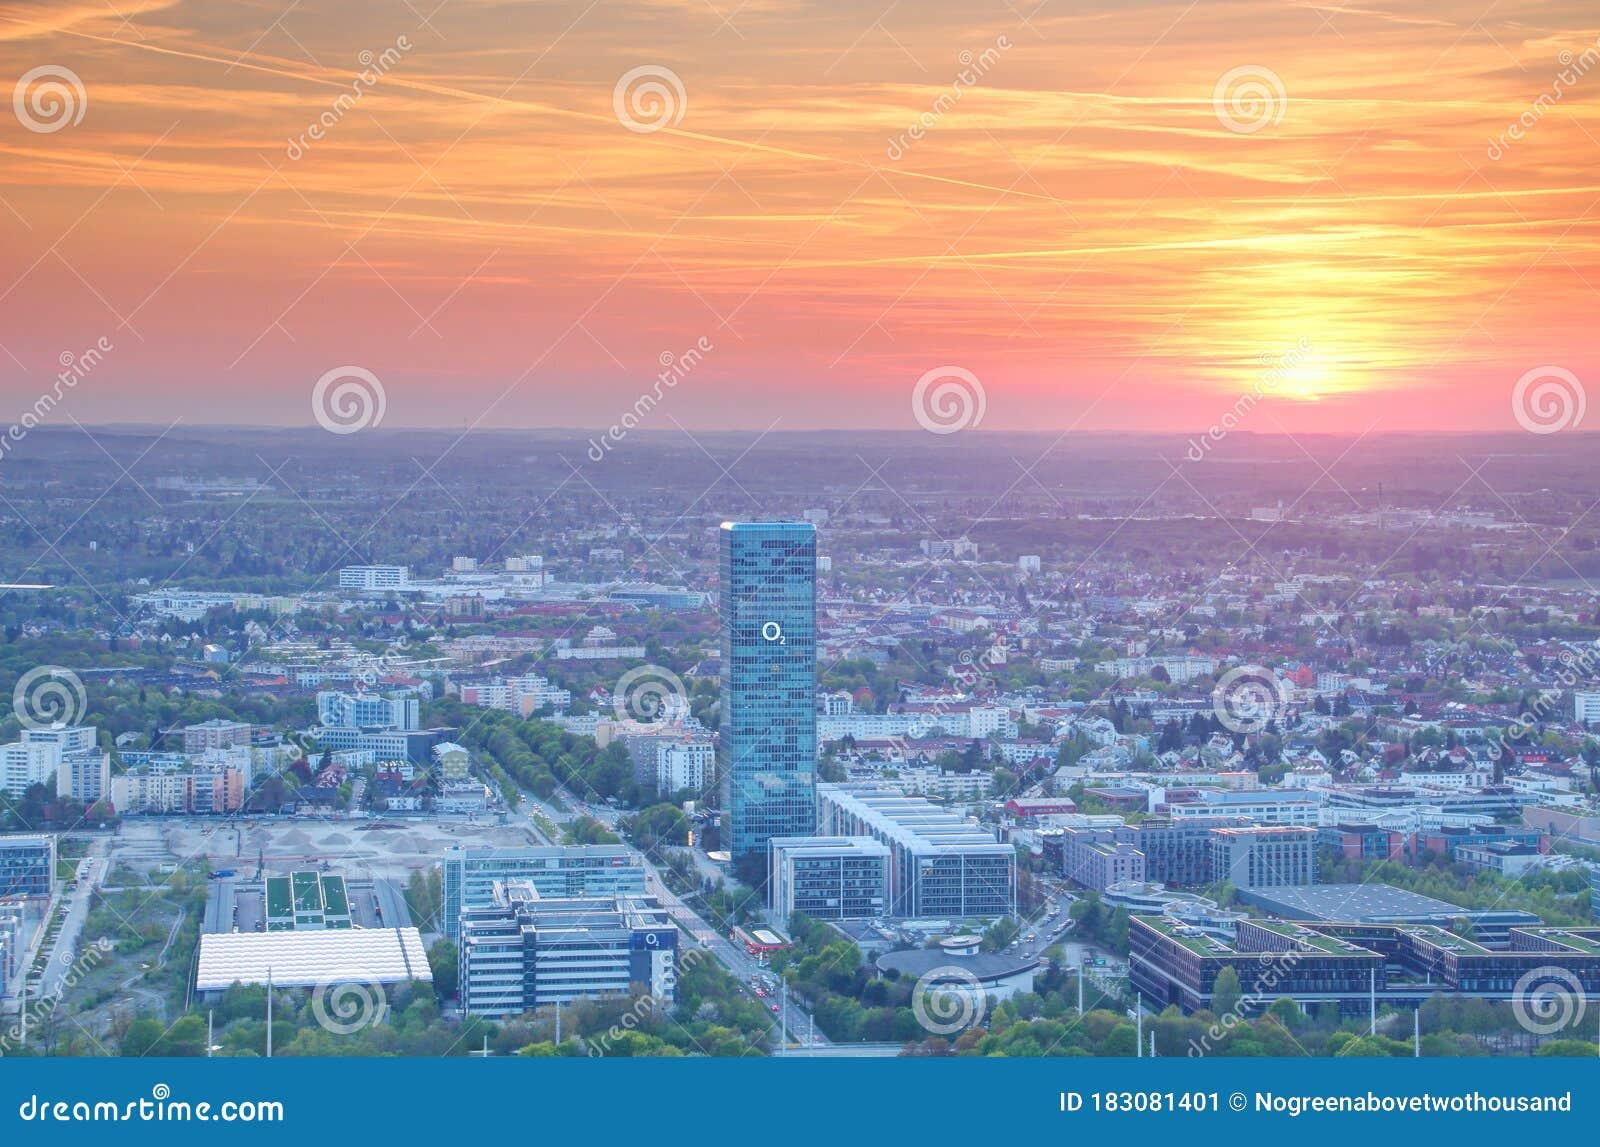 Red light district münchen